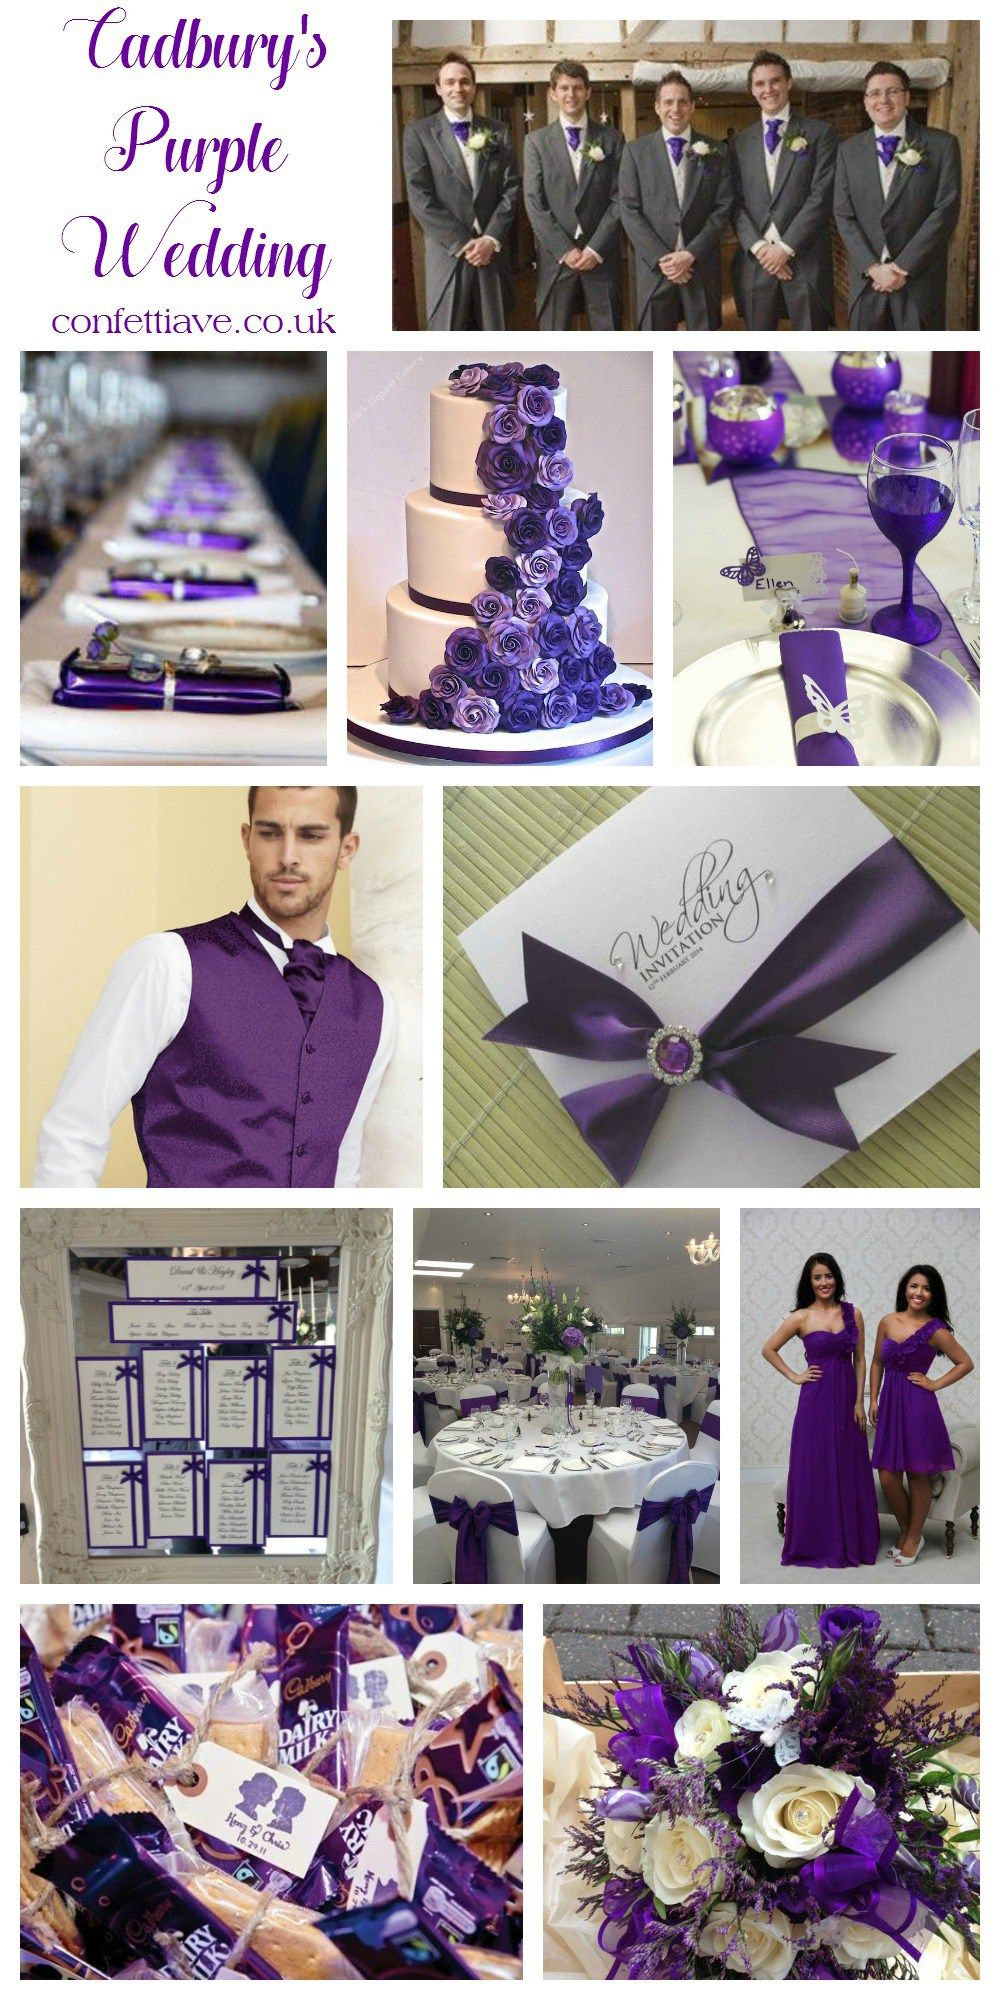 cadburys purple wedding colour scheme mood board | Свадебный ...